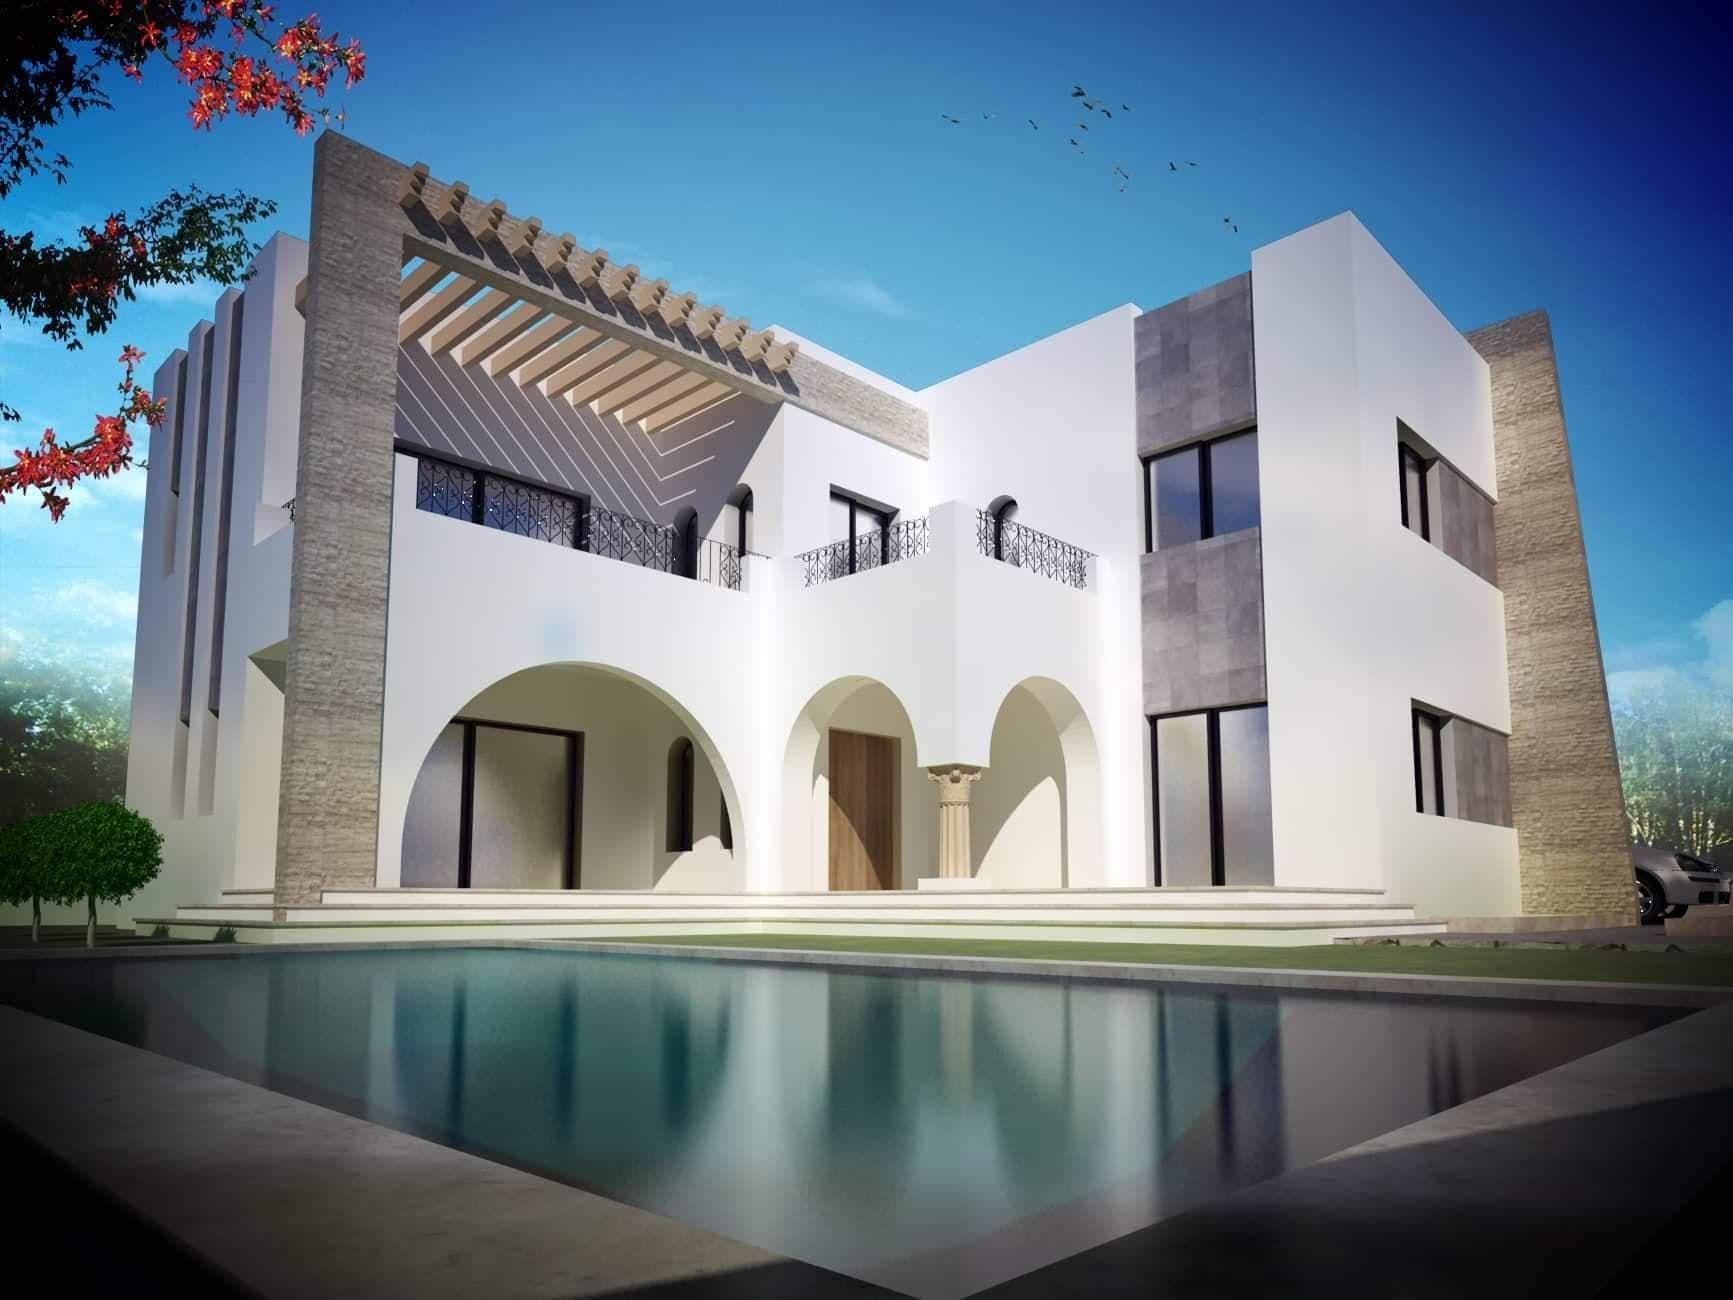 Villa brunella 2 réf: villa avec piscine